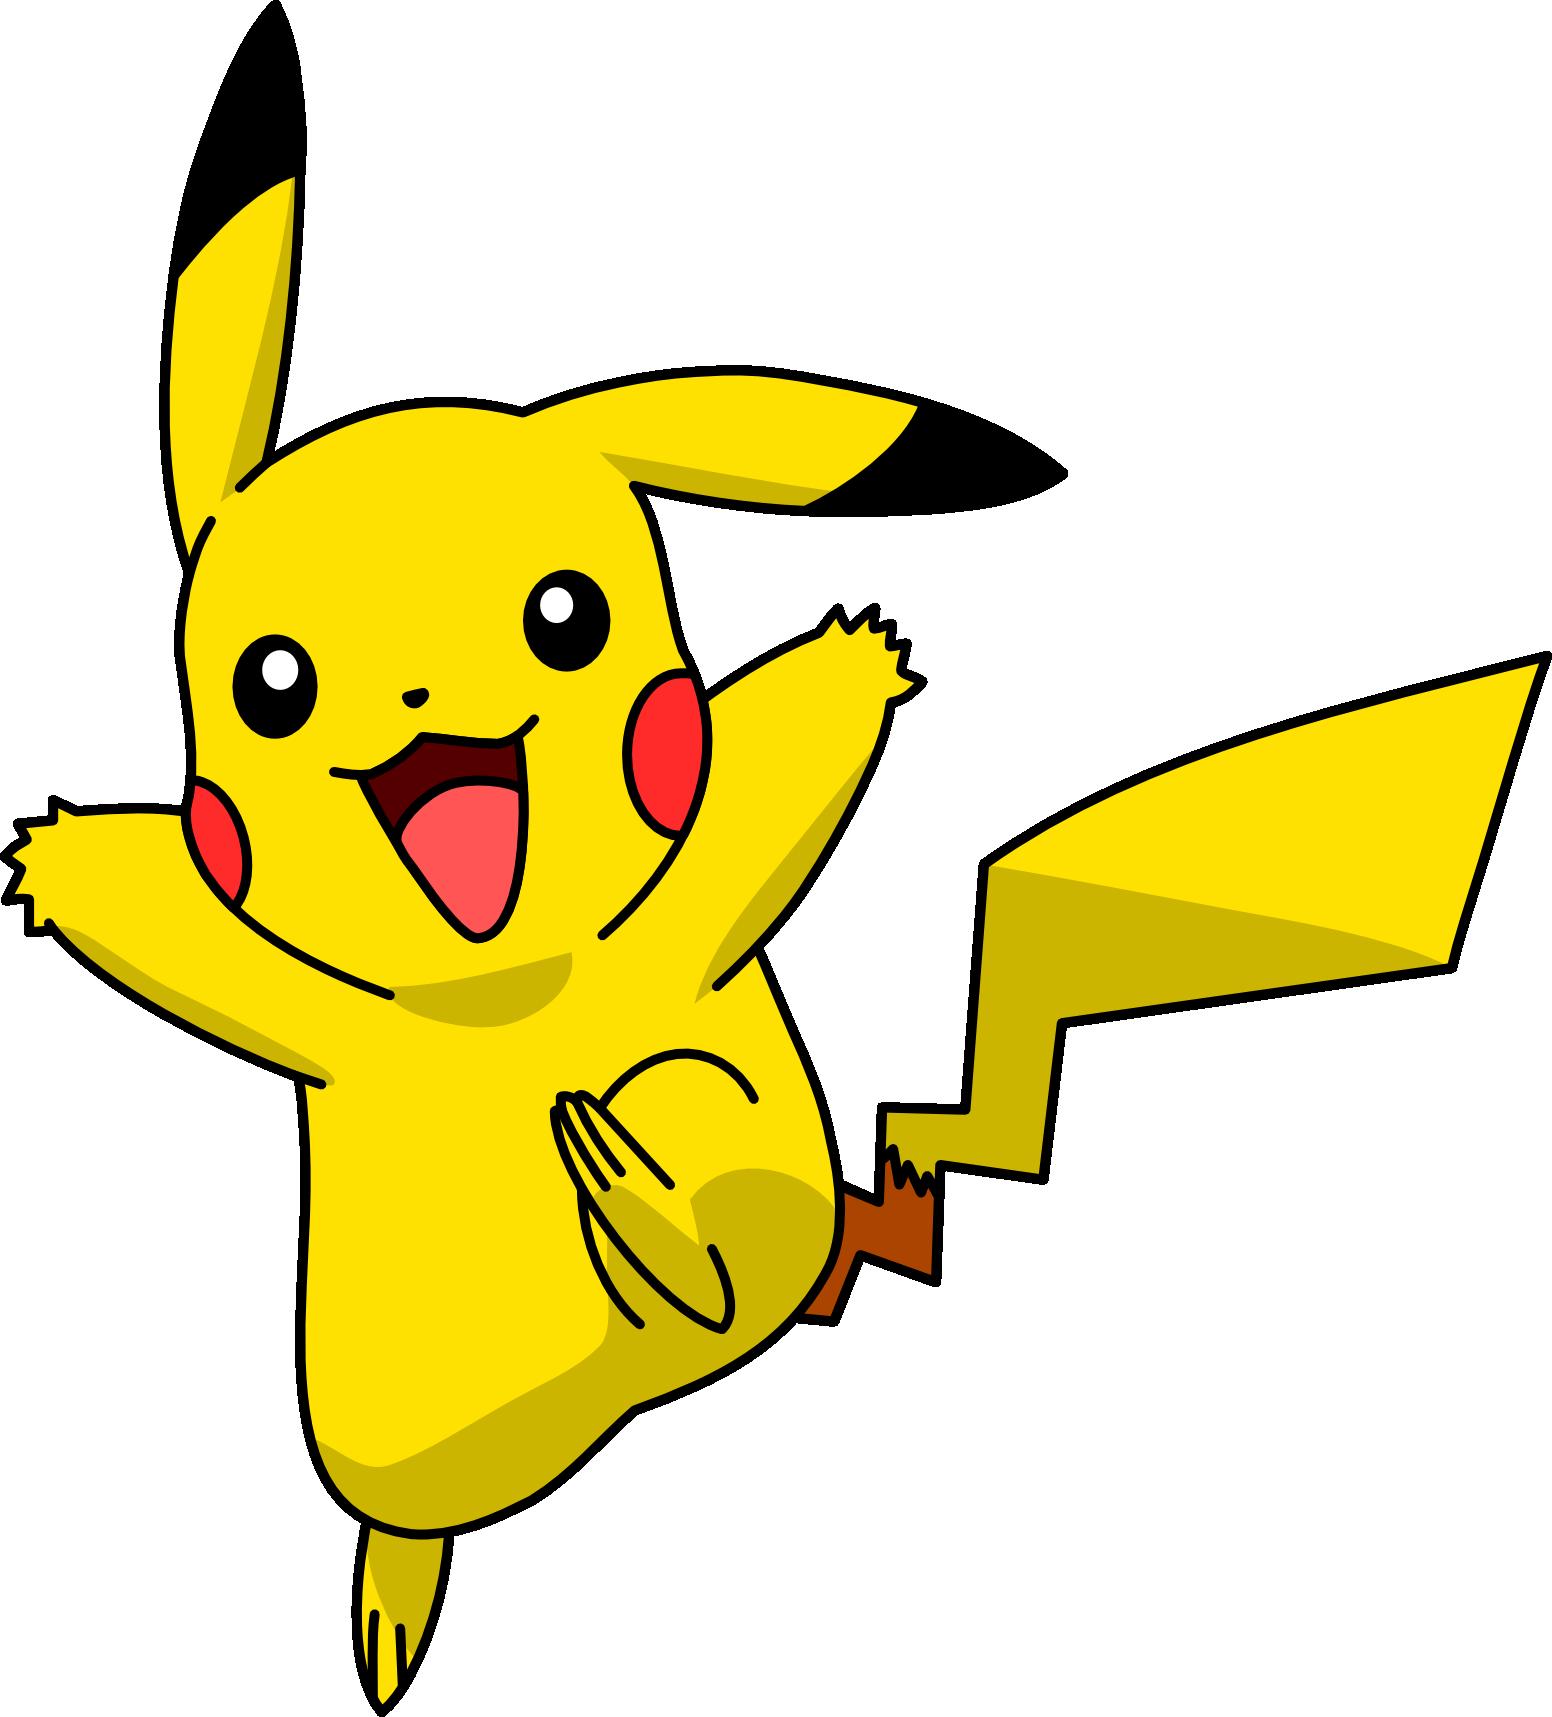 Pikachu clipart vector Mighty355 by Pikachu DeviantArt Pikachu